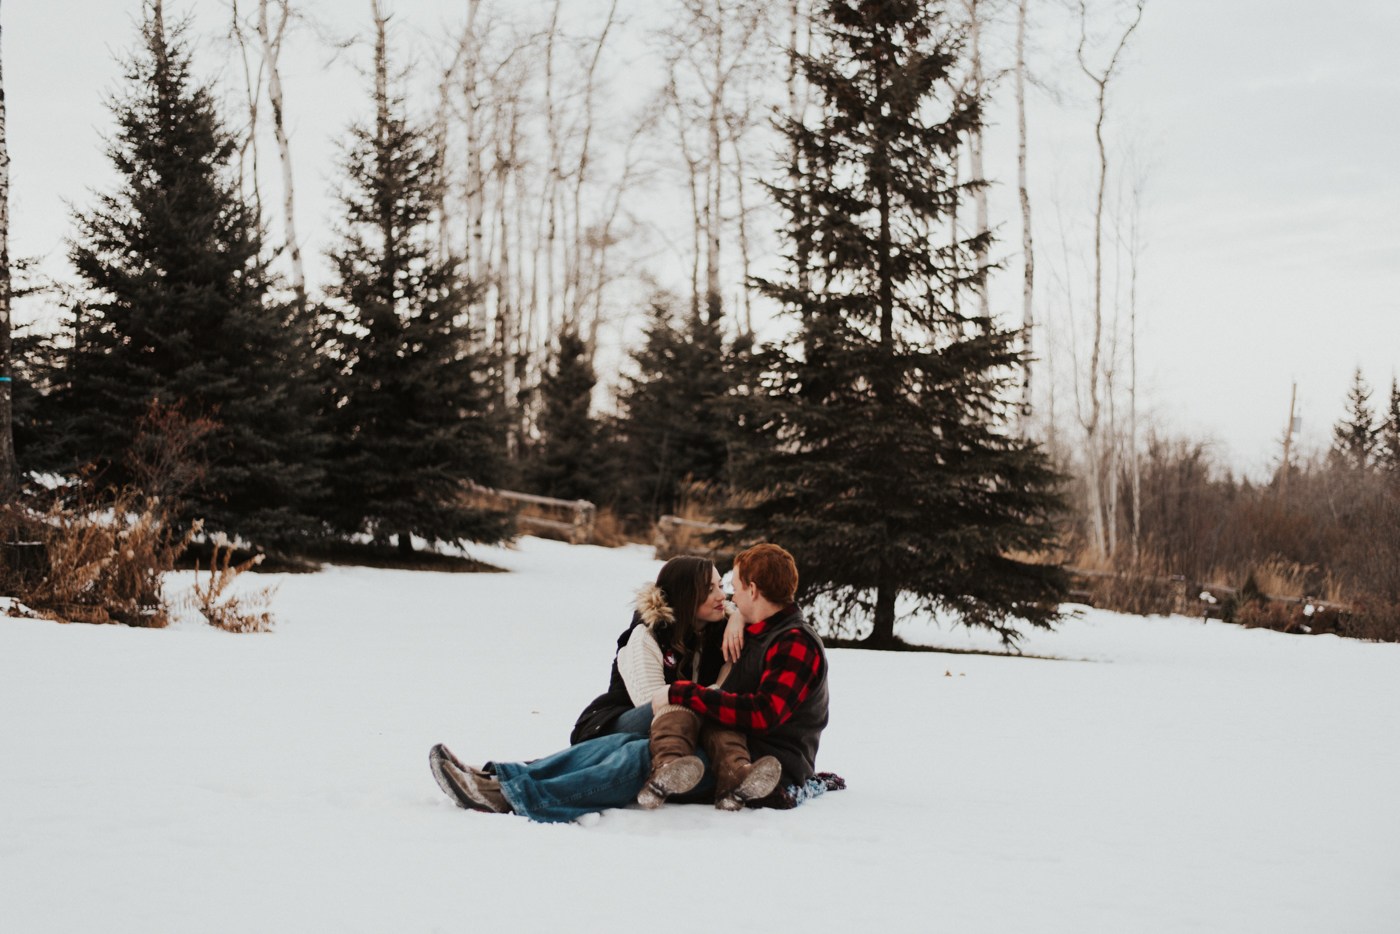 FortSt.John_photographer_TyraEPhotography_Wedding_Couple_Family_Photograhy_DawsonCreek_Elopement_Bride_Boduoir_Portraits-7575.jpg